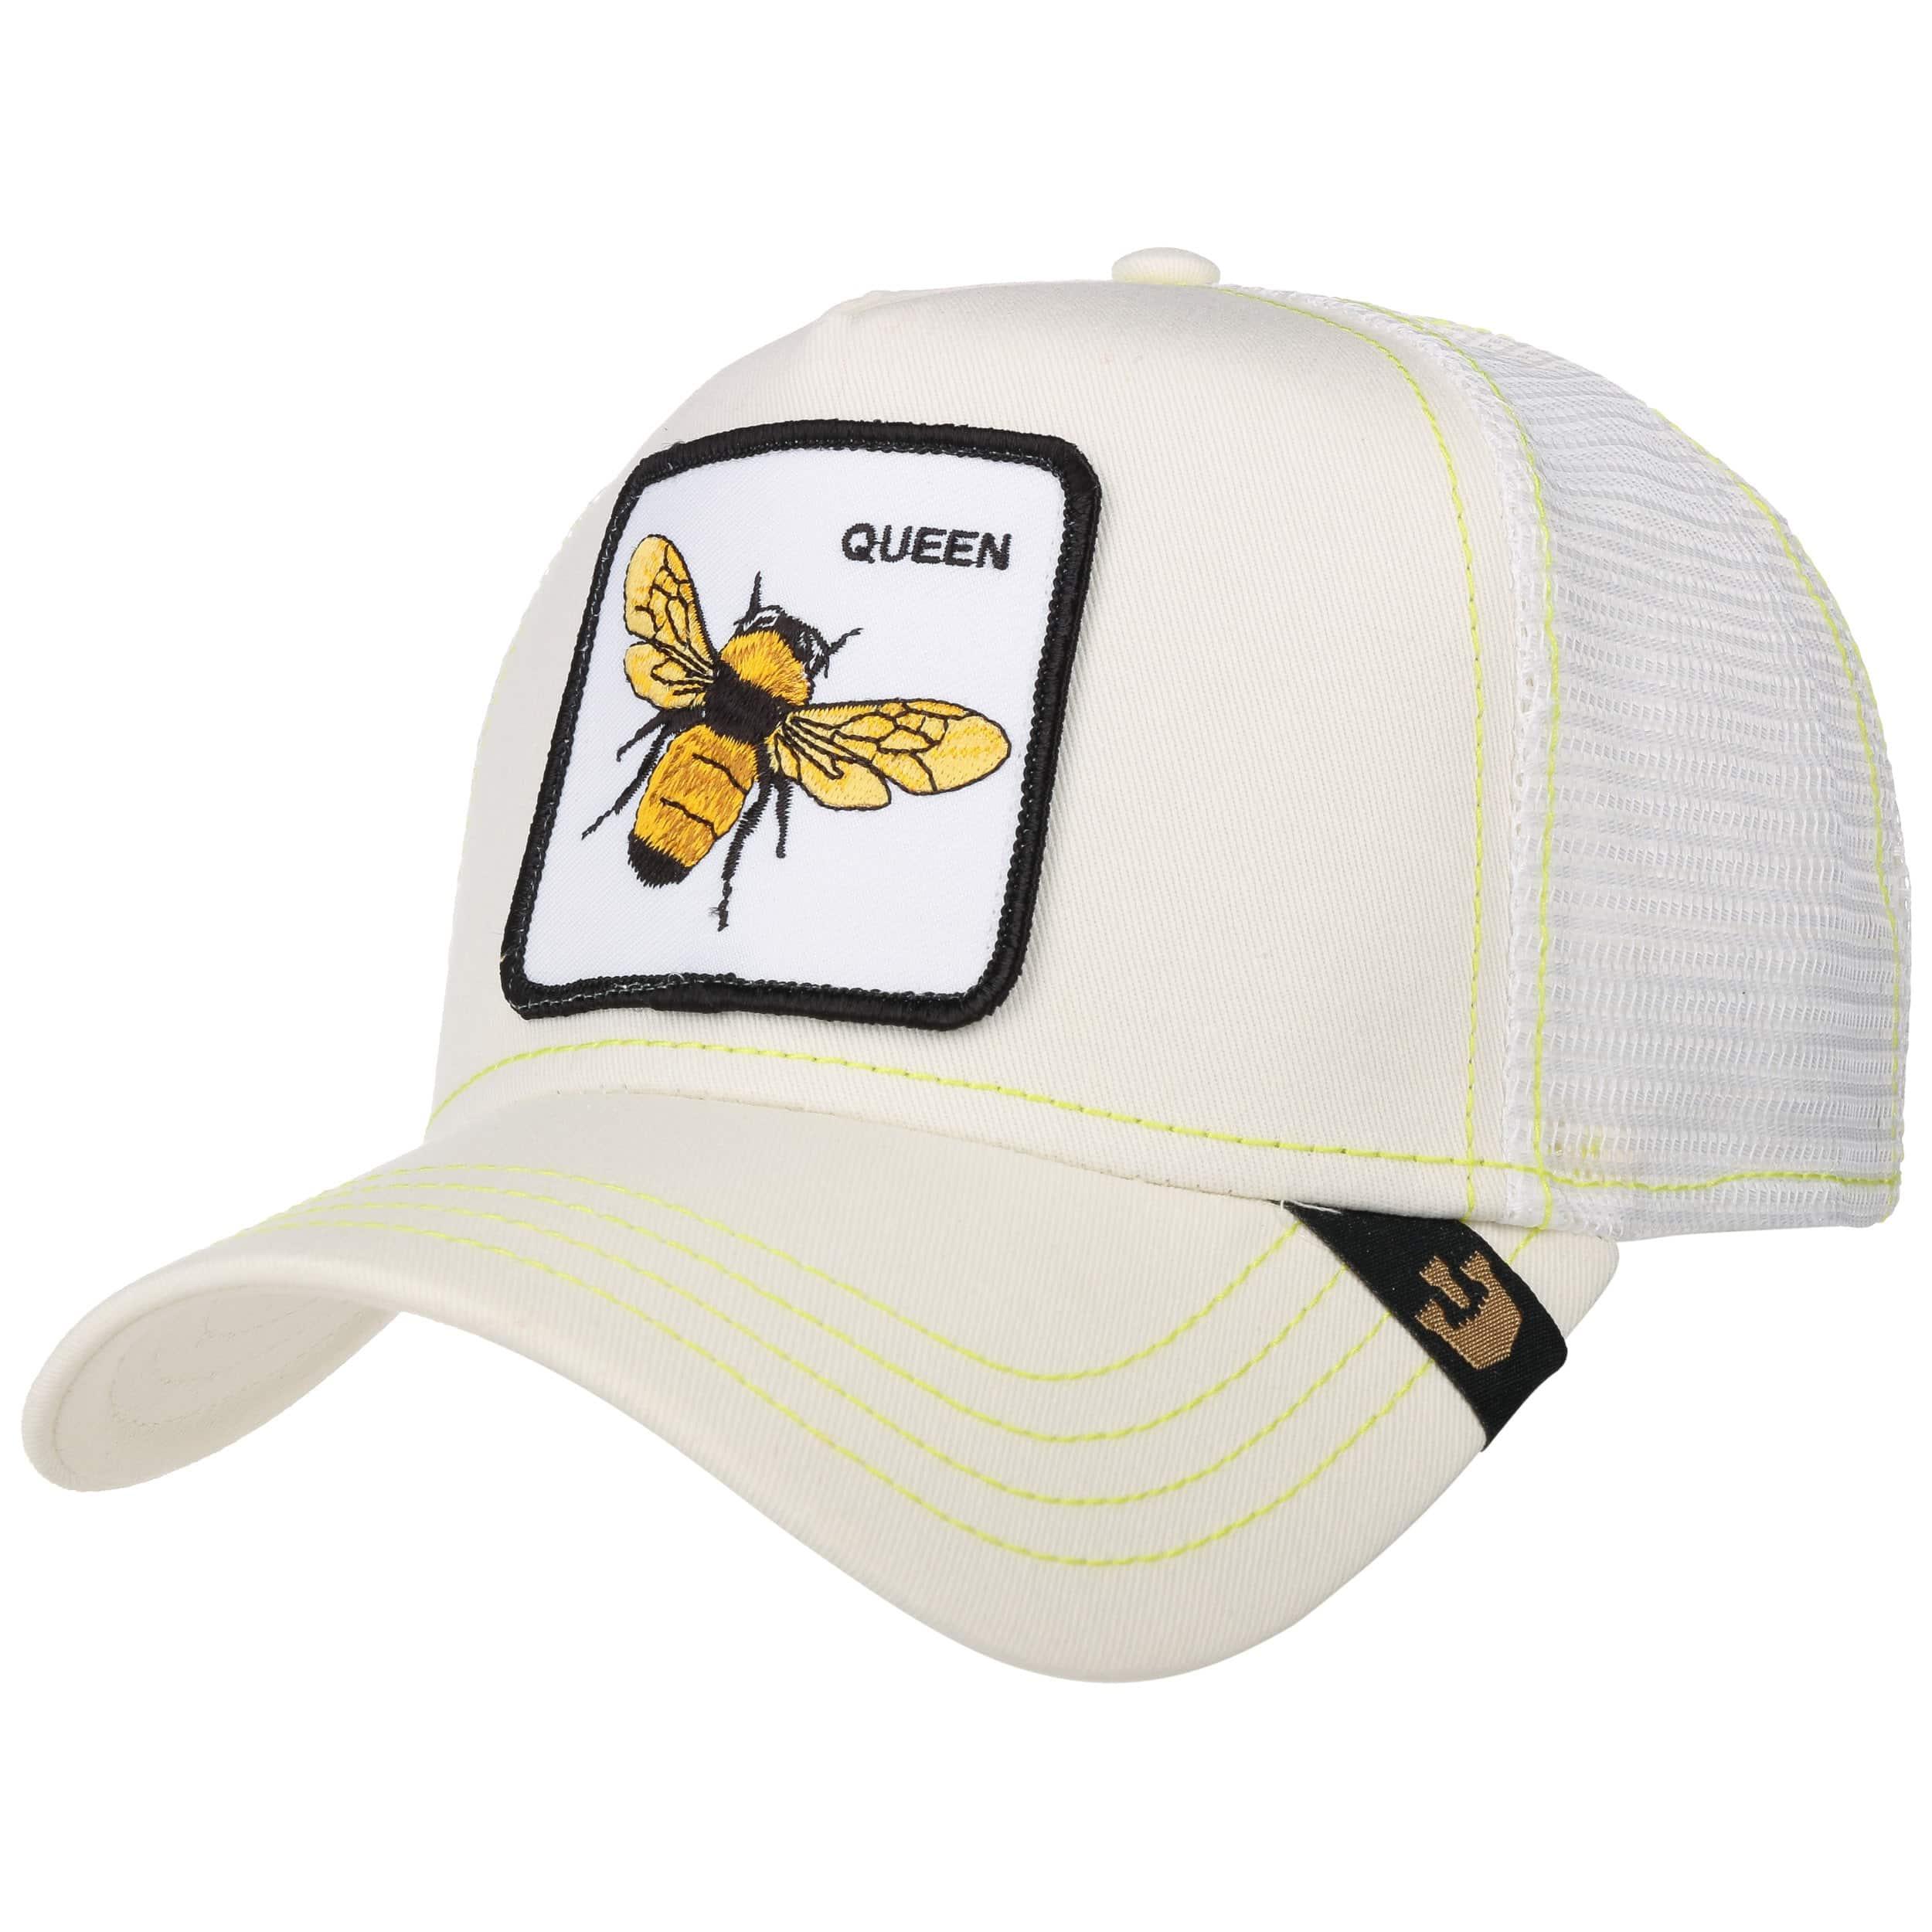 Queen Bee Trucker Cap. by Goorin Bros. 4e718dcb014